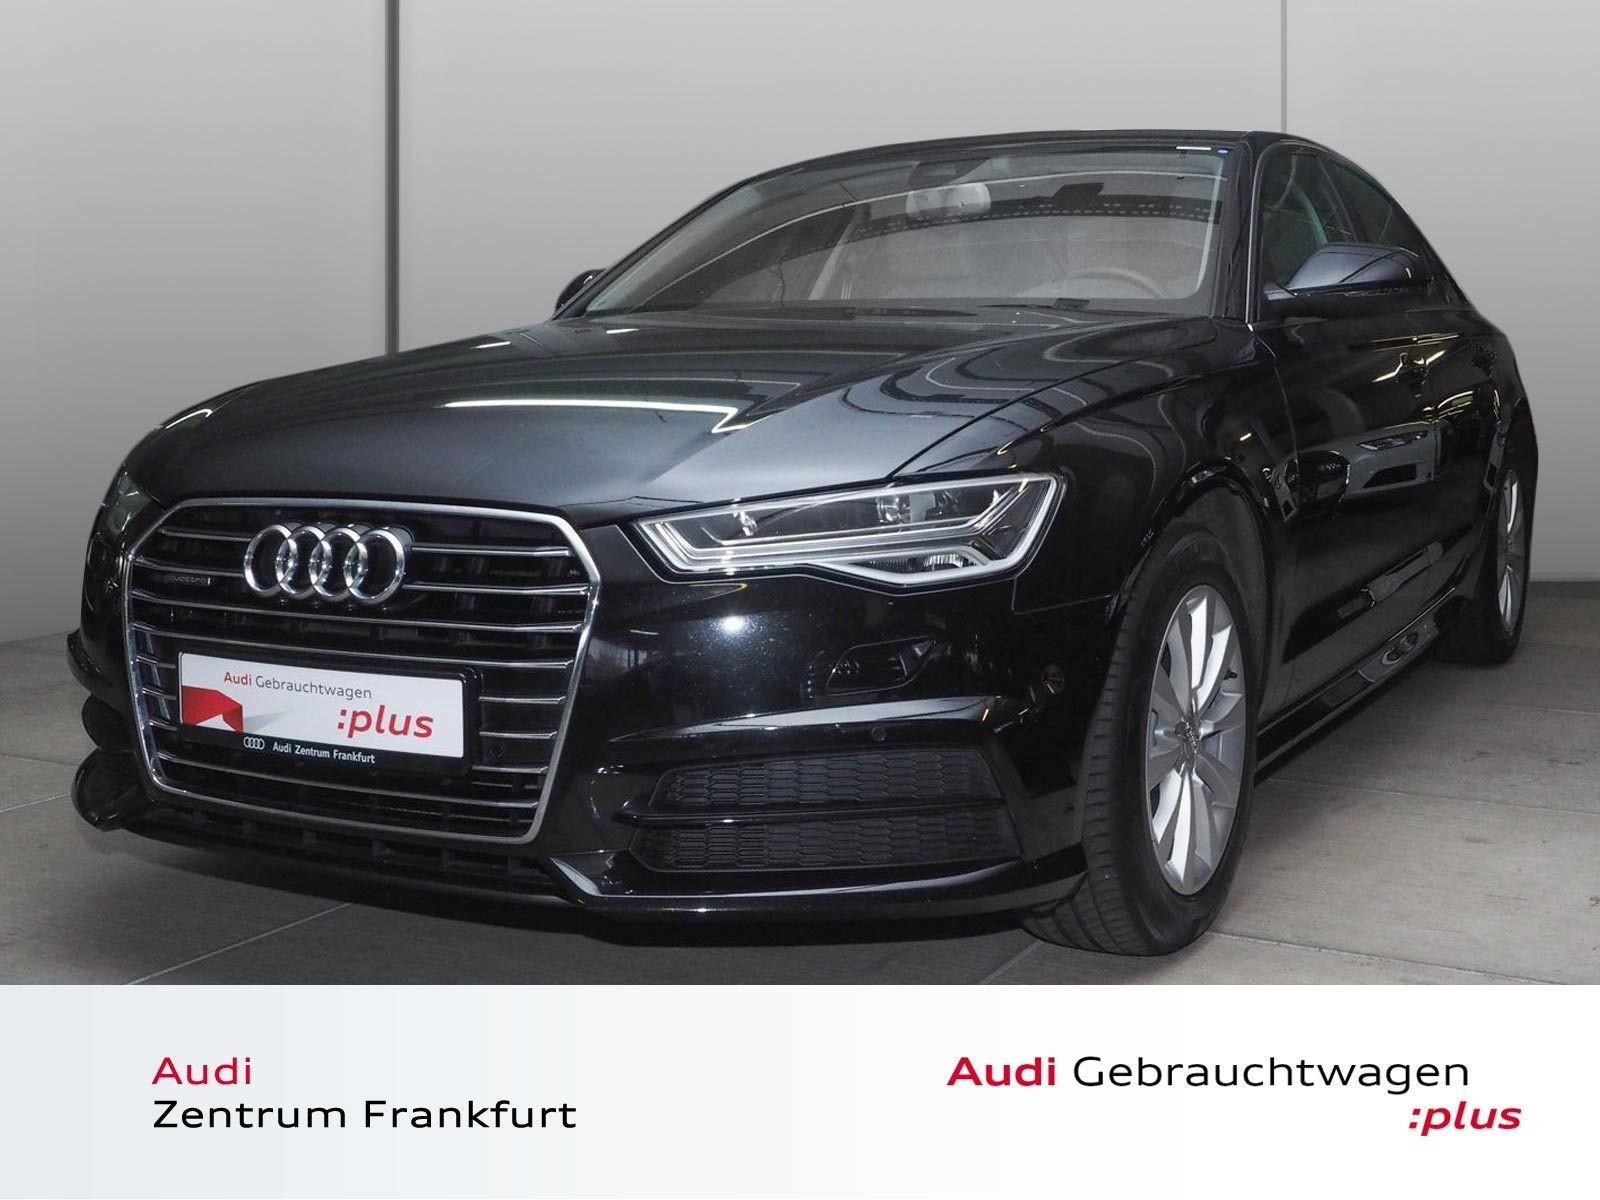 Audi A6 2.0 TFSI quattro S tronic Navi LED Leder PDC, Jahr 2016, Benzin